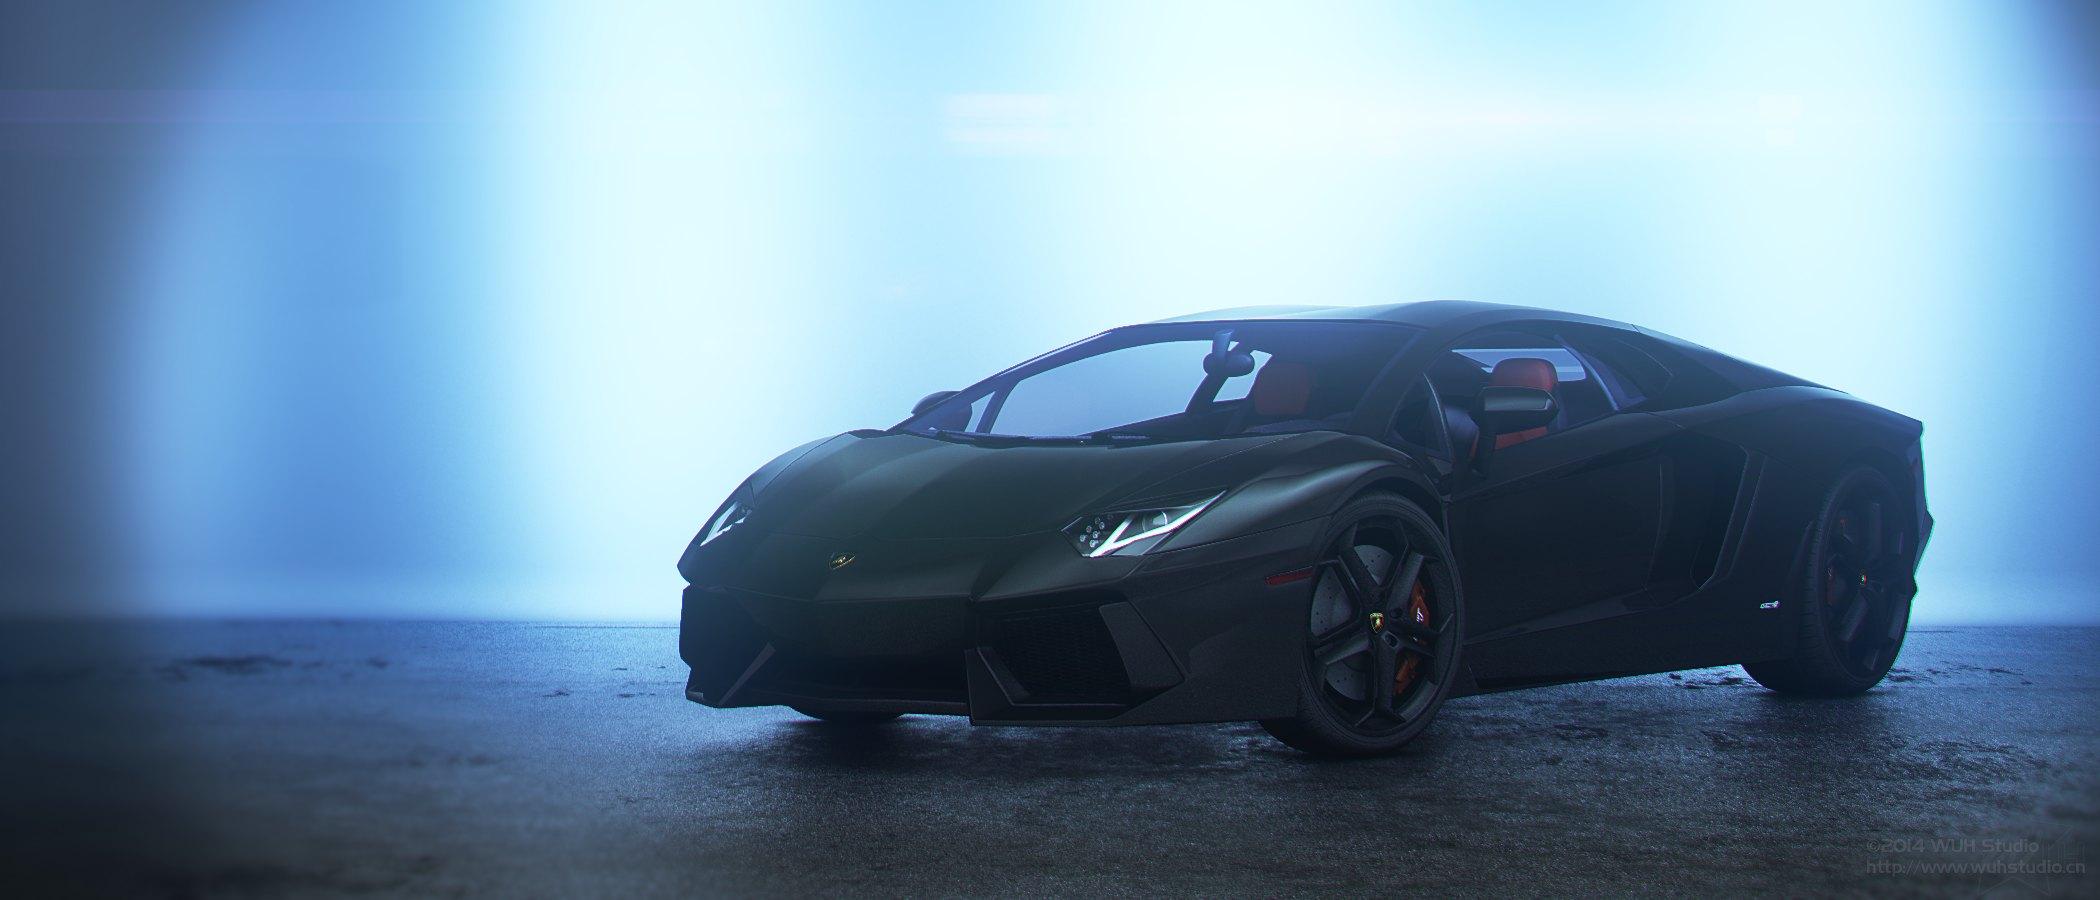 2014 Lamborghini Aventador LP700